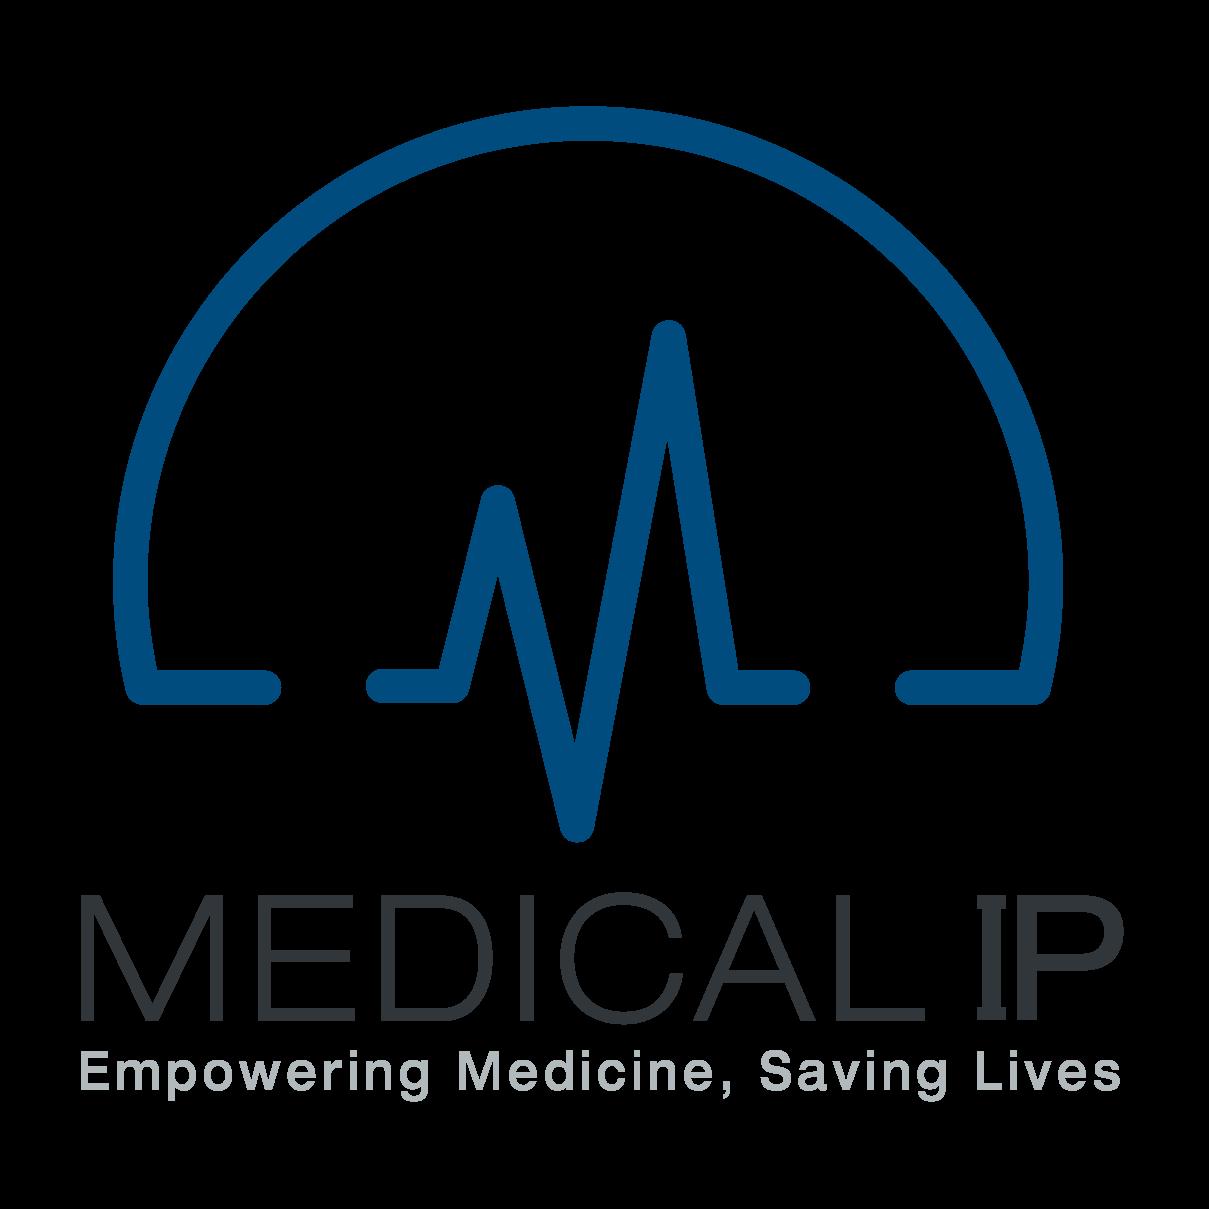 MEDICAL IP